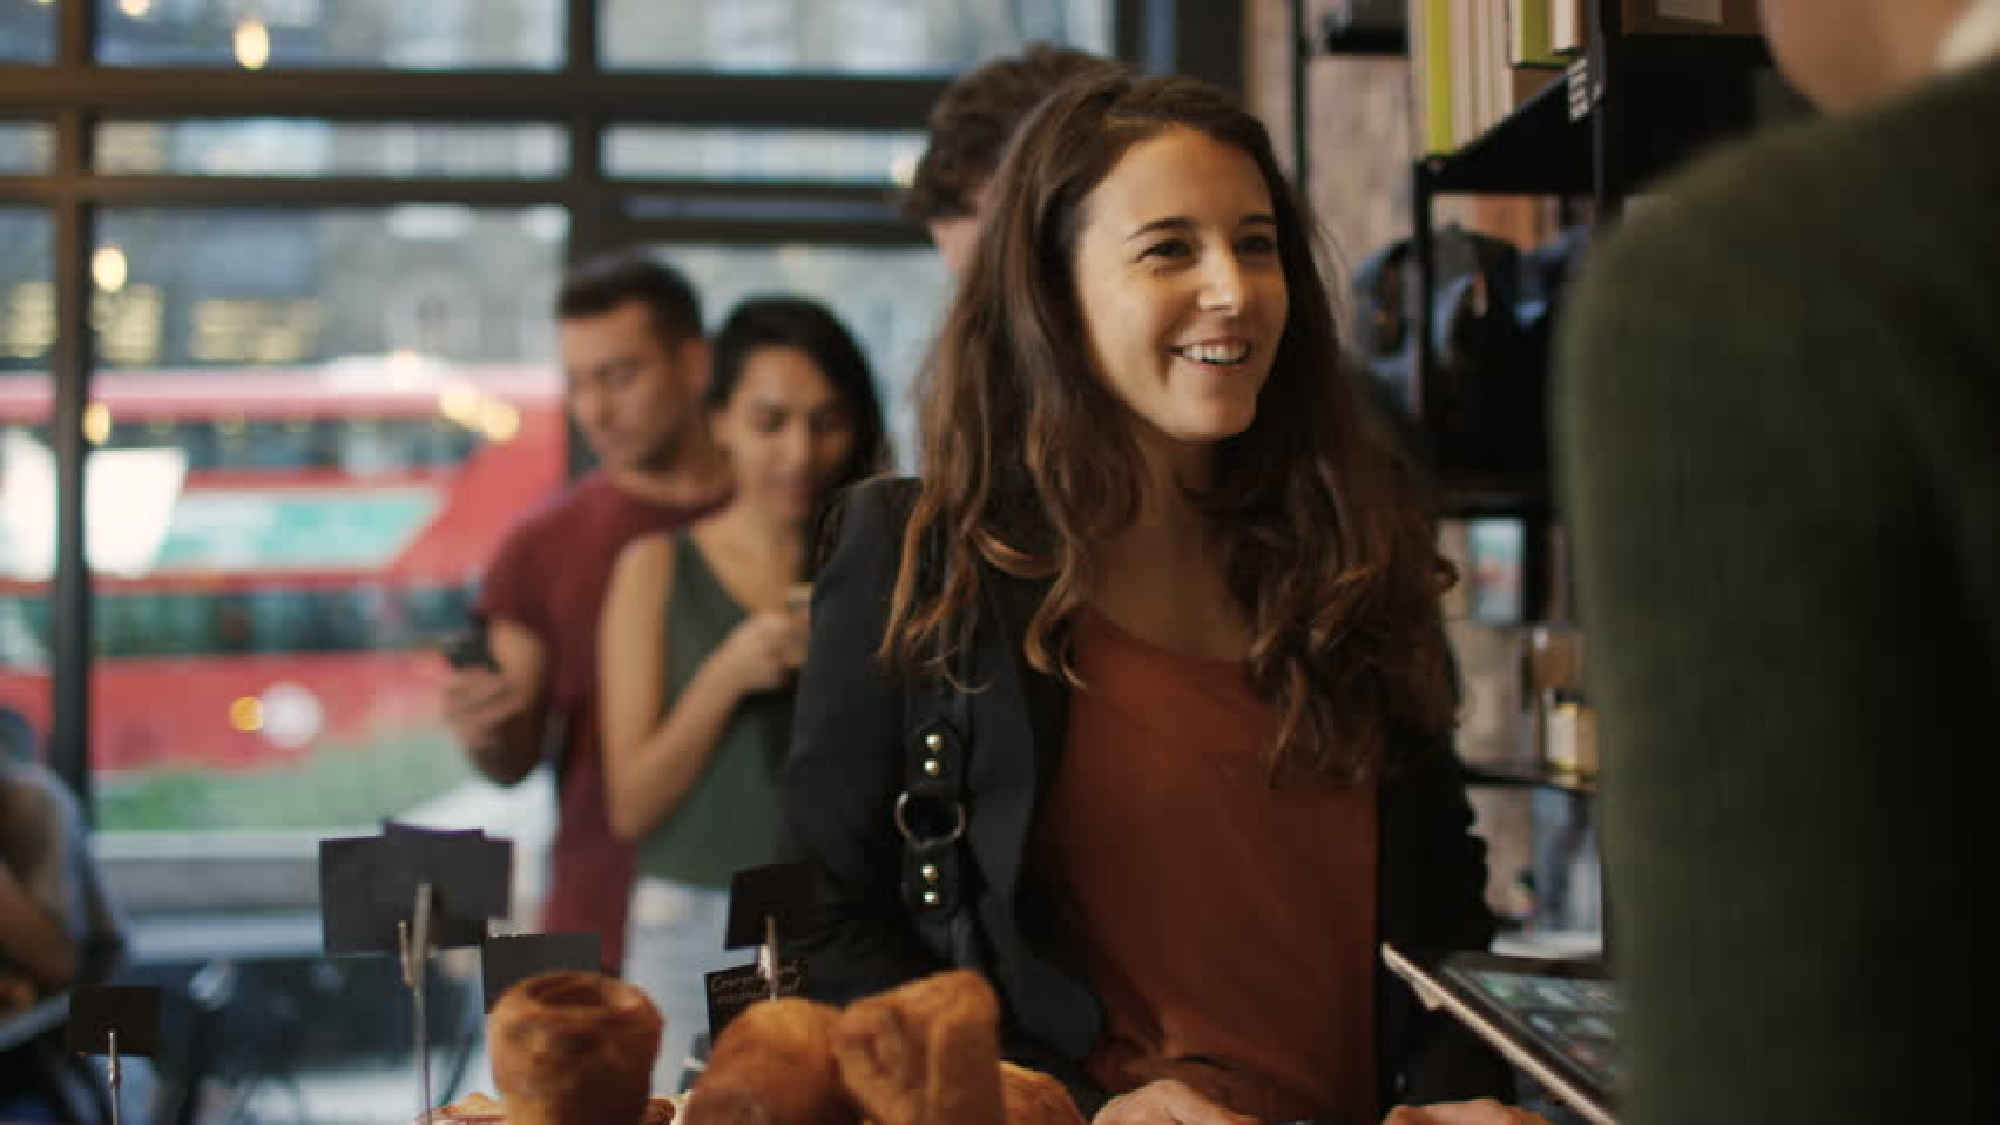 Coffee Queue at Flex Rewards Merchant